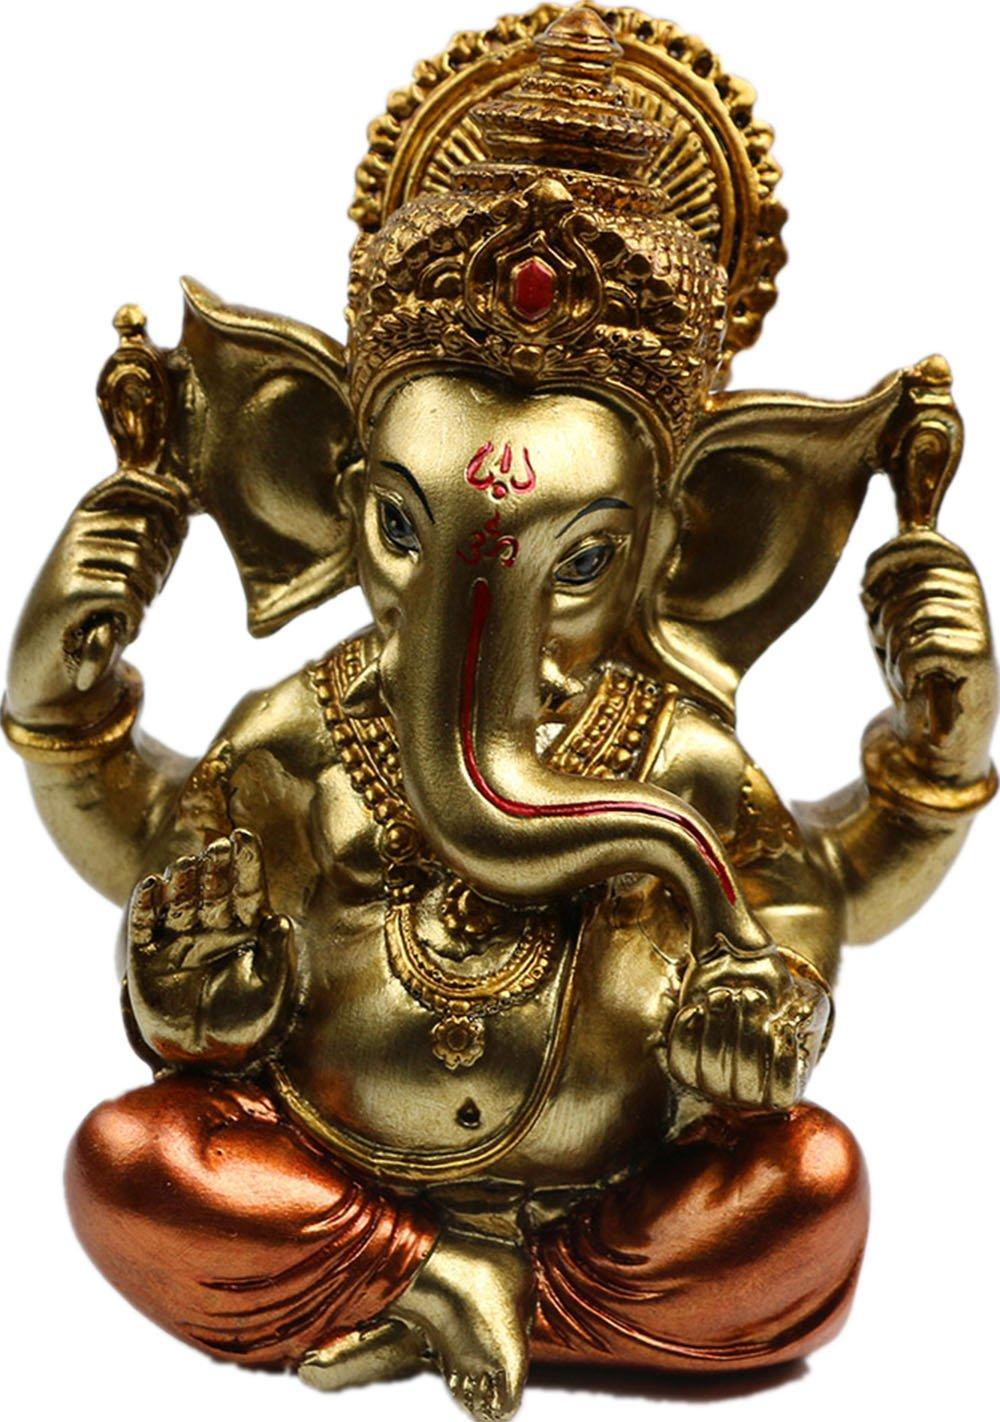 BangBangDa 6.3'' H Resin Hindu God Statue Ganesh Figurine India Buddha Elephant Lord Ganesha Sculpture Indian Idol Religious Car Accessories Diwali Decoration Home Décor Wedding Gift (Antique Copper)